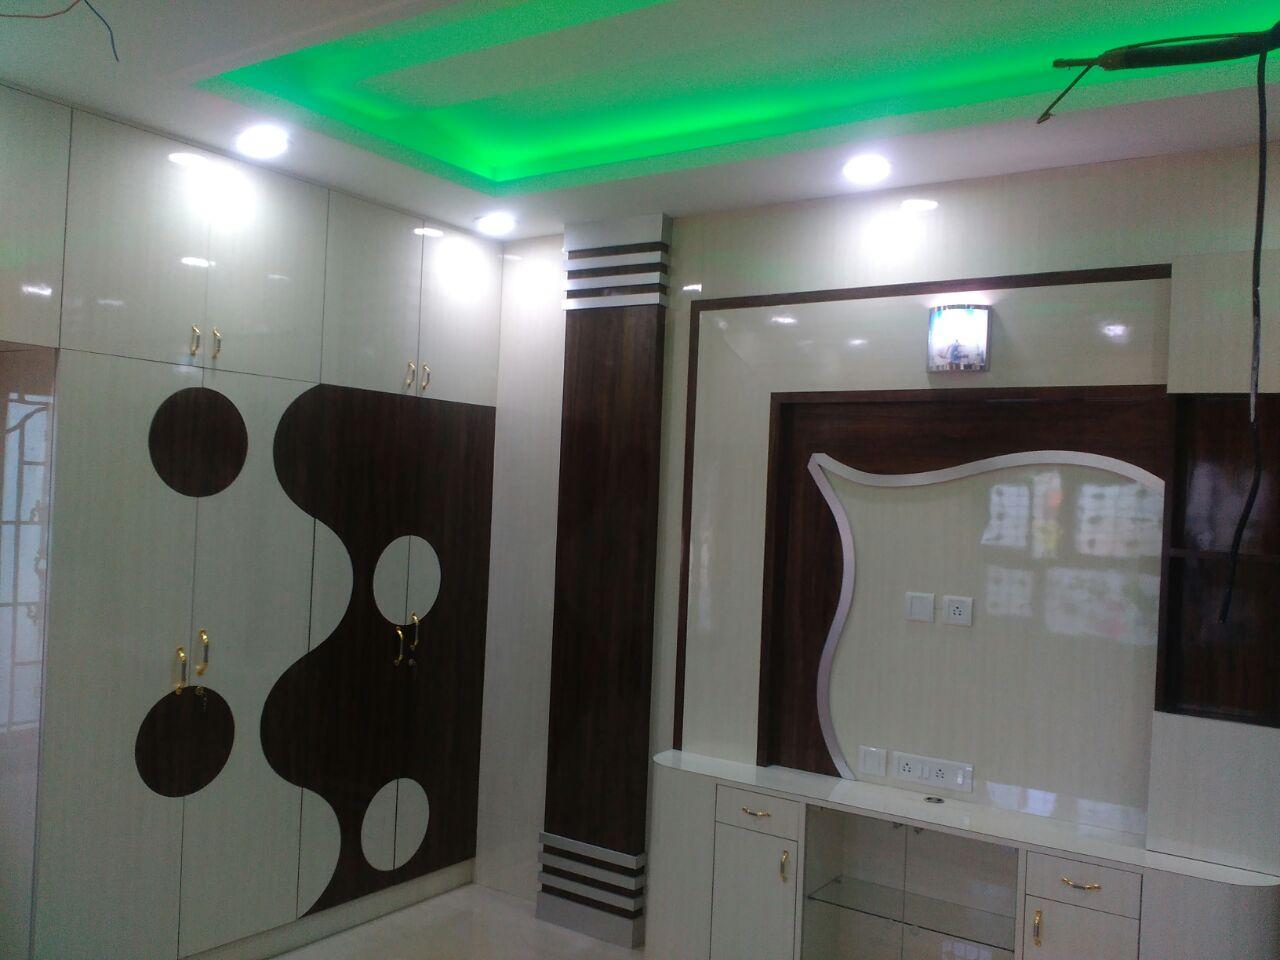 individual-house-for-sale-in-tiruvanmiyur-ecr-chennai   Deal A Property